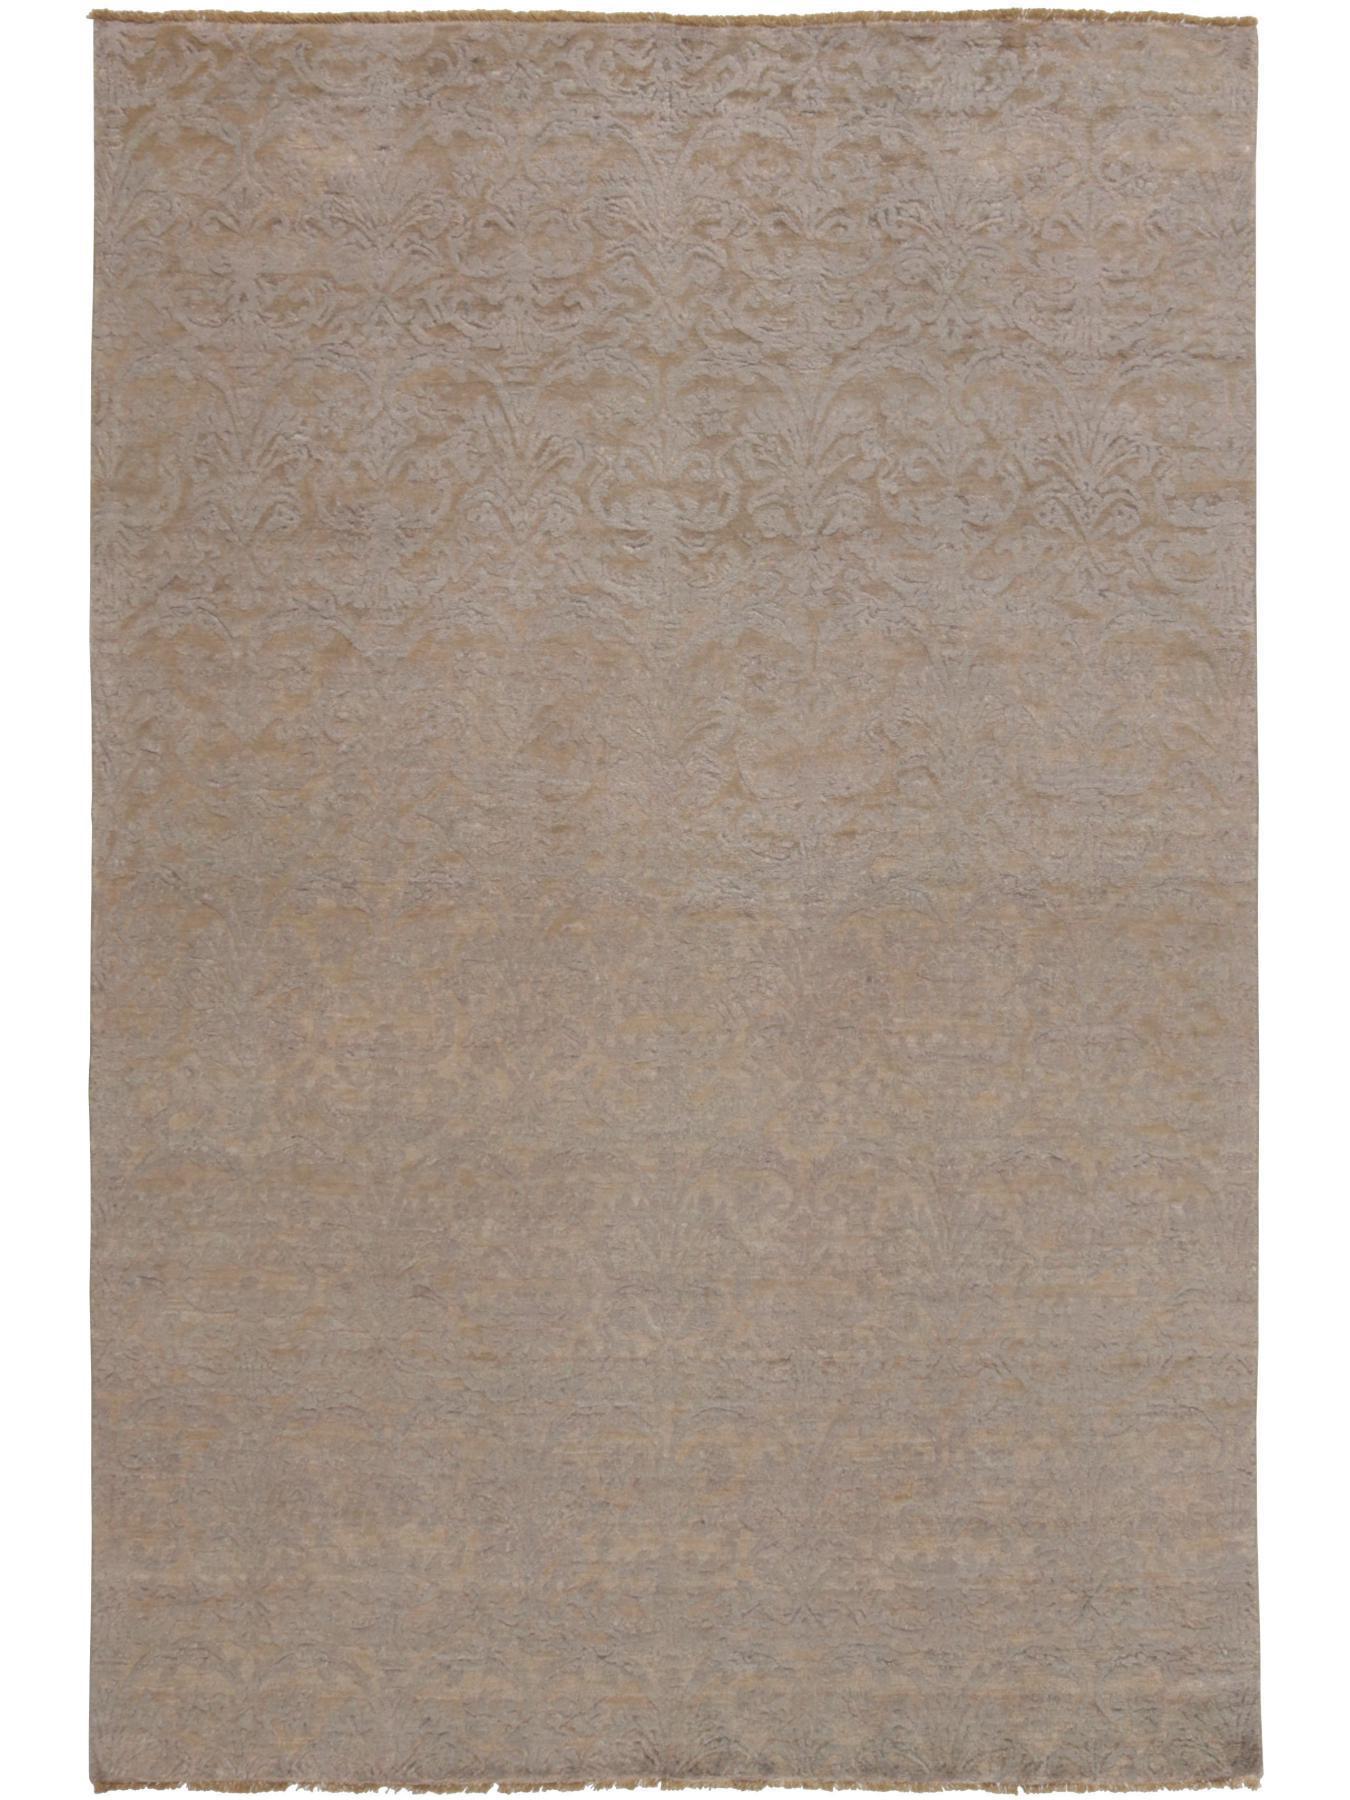 Luxury carpets - Damask-AL-2 B-34/B-33